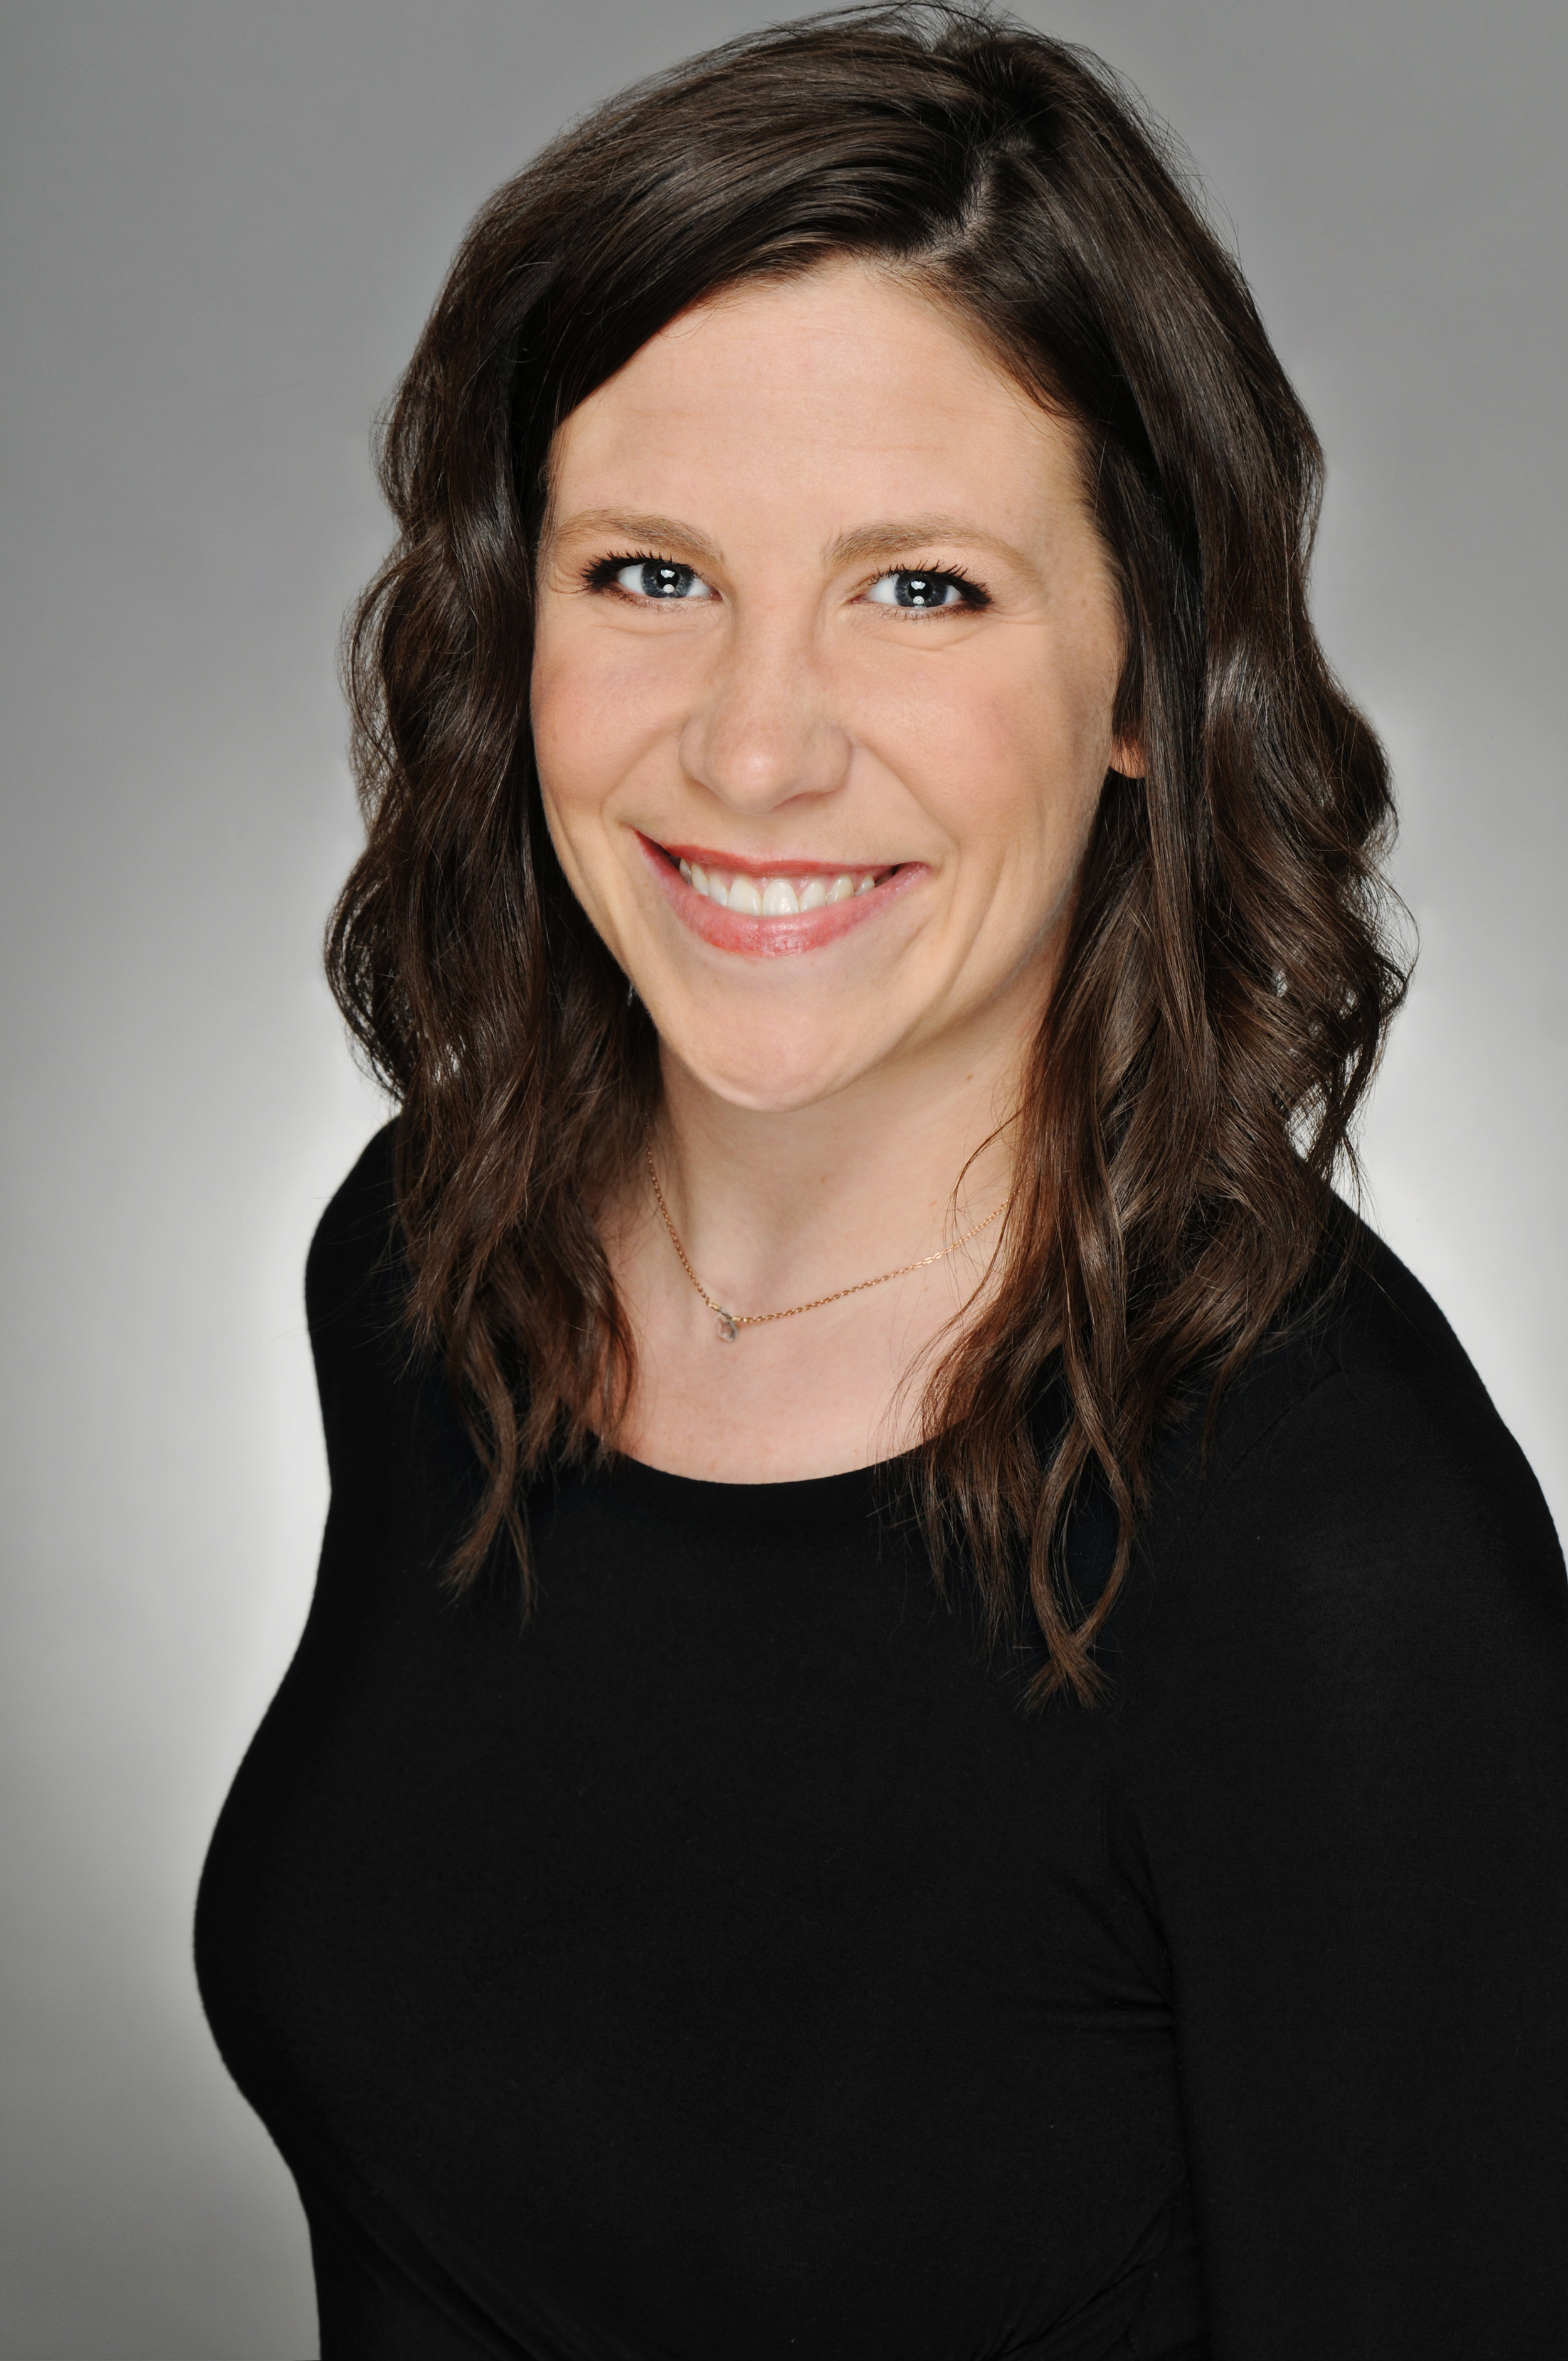 Hanna Kleiner, LPC-MHSP, Behavioral Health Services Director